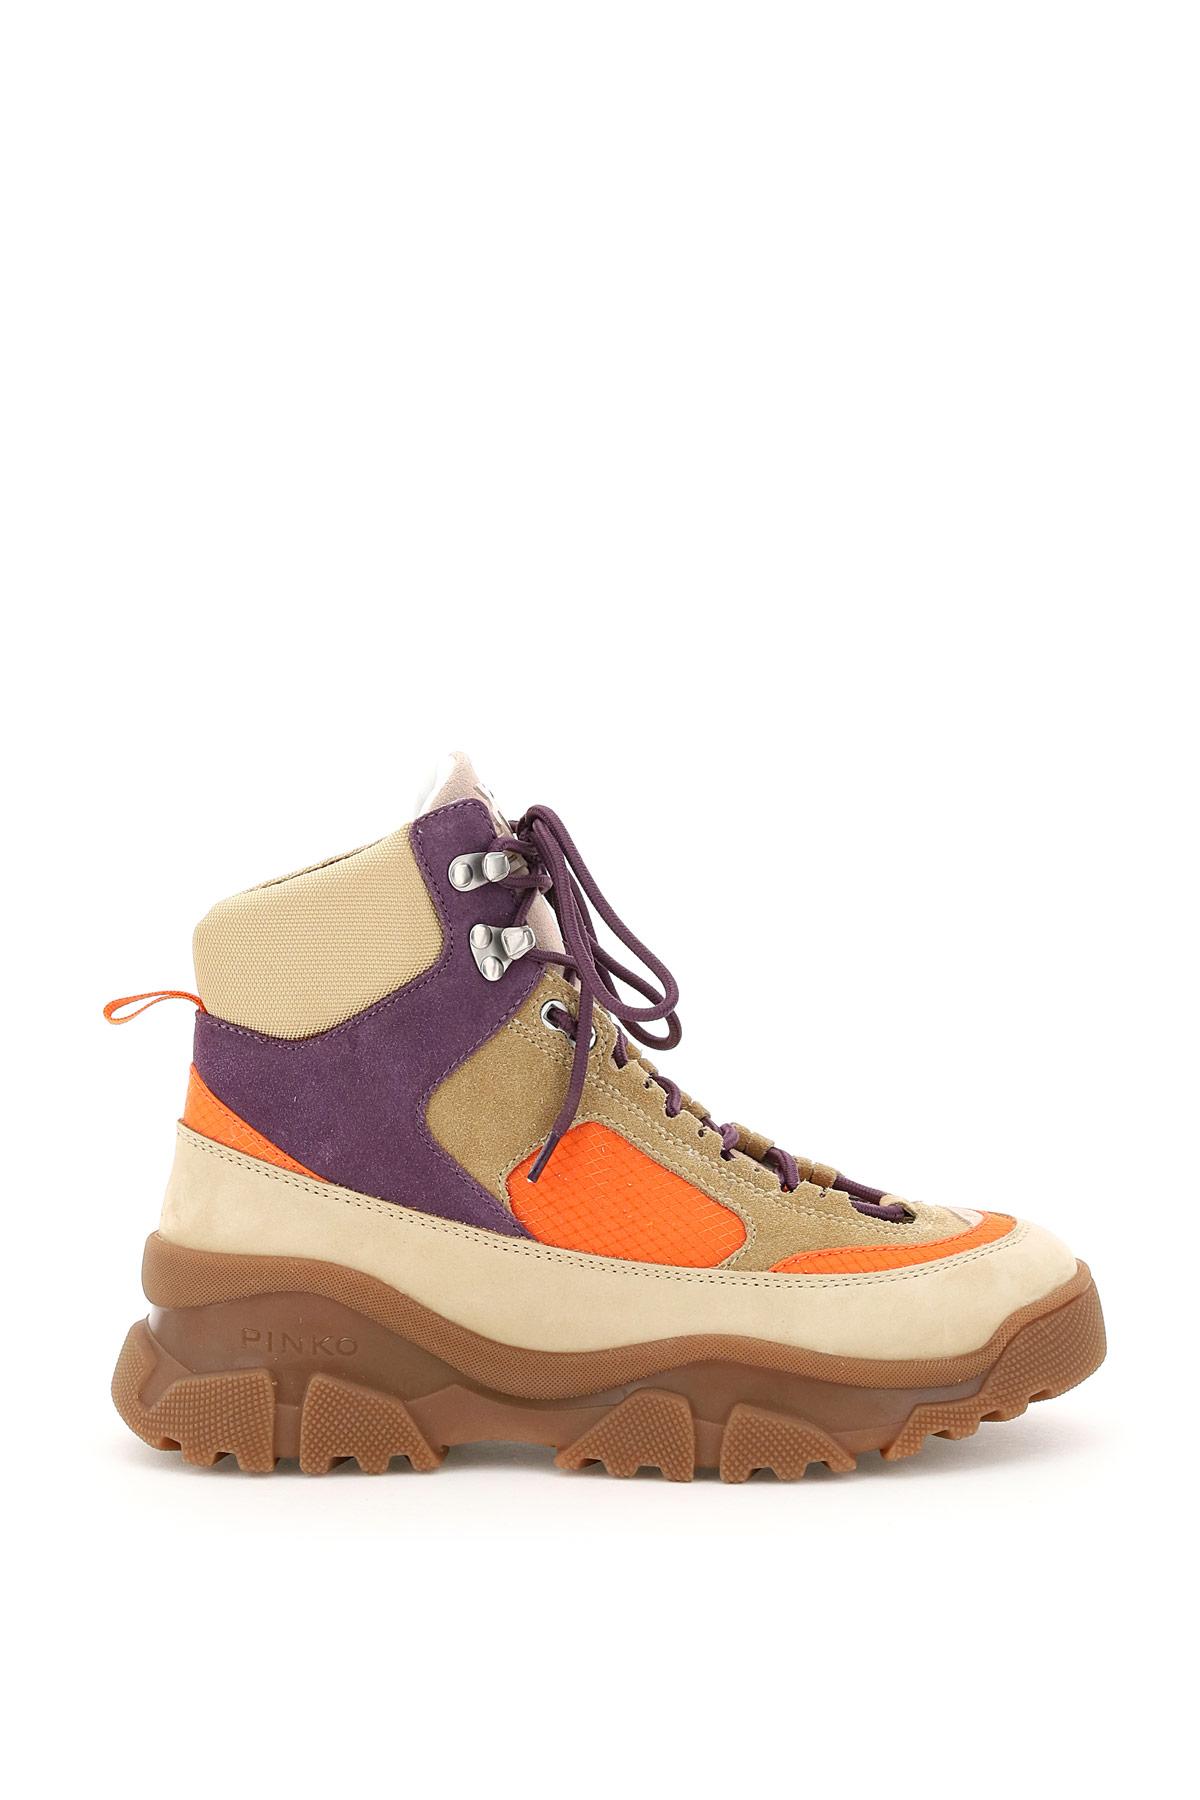 PINKO LOVE TREK 2 HIGH SNEAKERS 35 Orange, Beige, Purple Leather, Technical